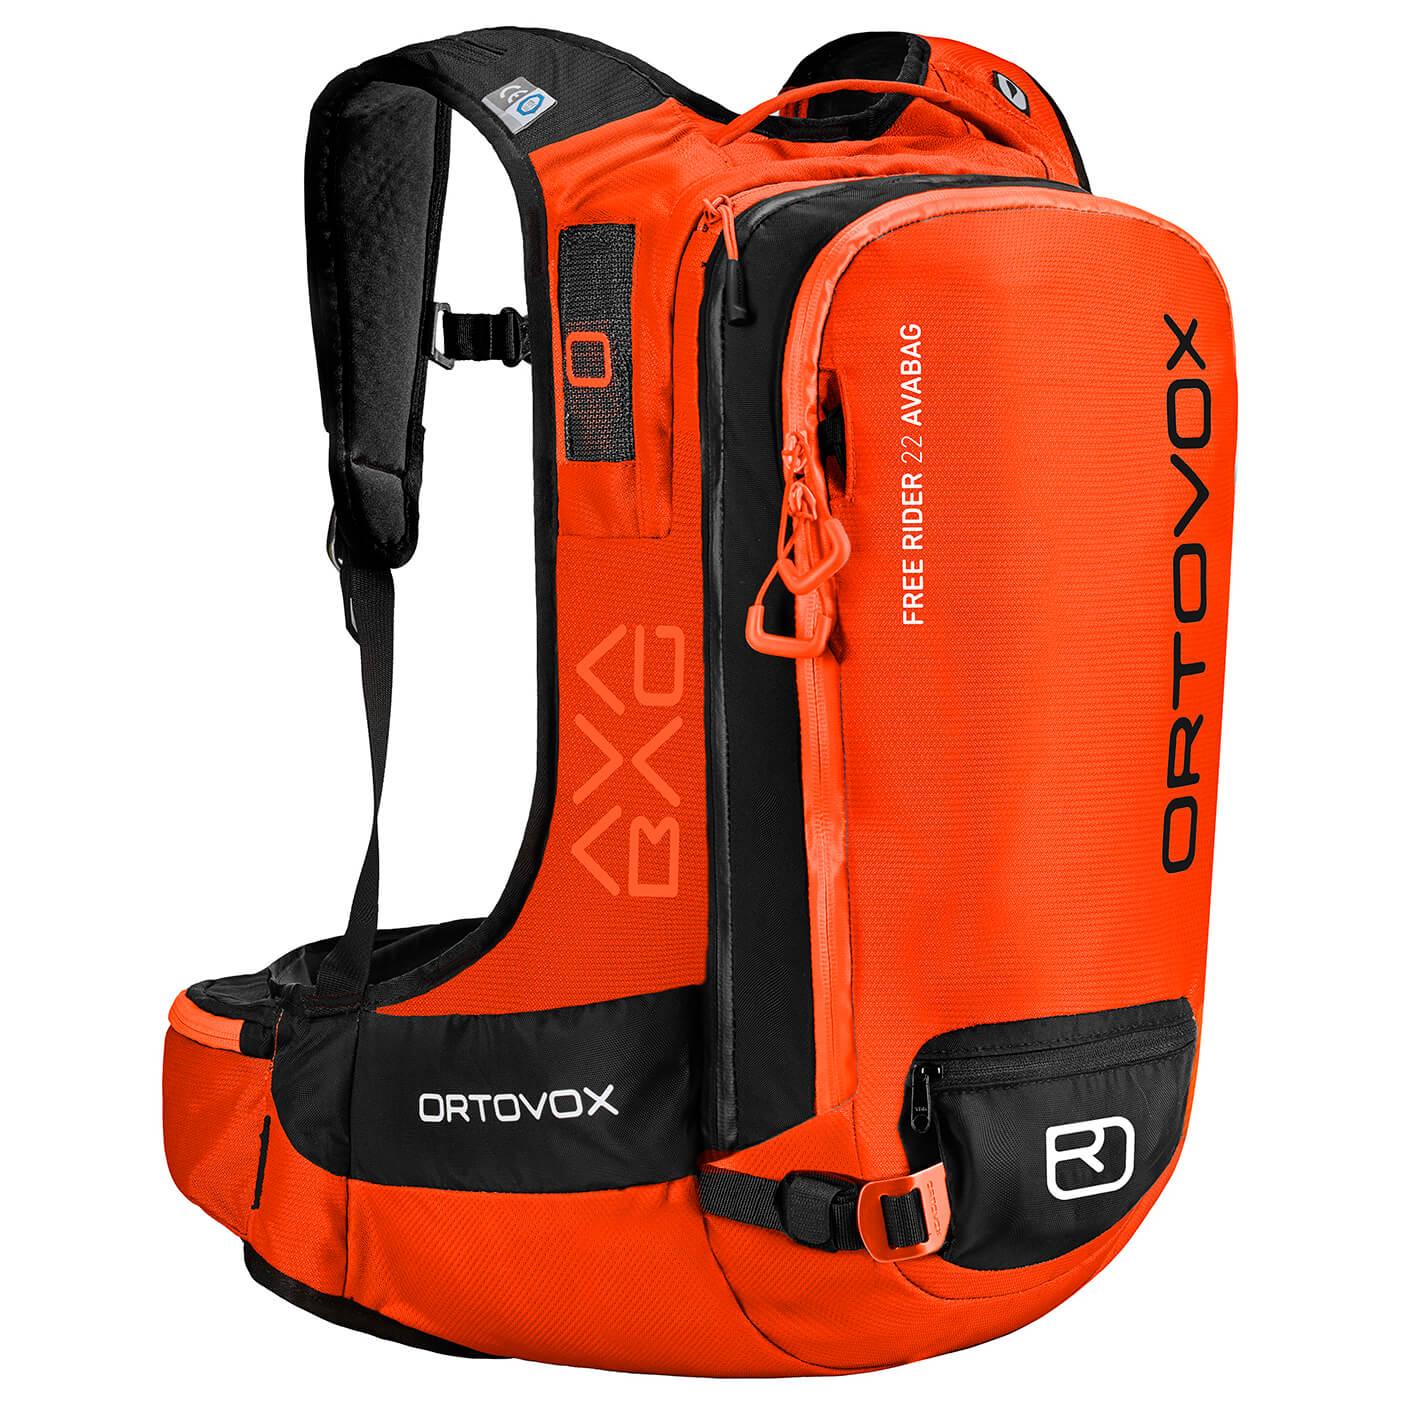 Ortovox Ski Backpack: Ortovox Free Rider 22 Avabag - Ski Touring Backpack